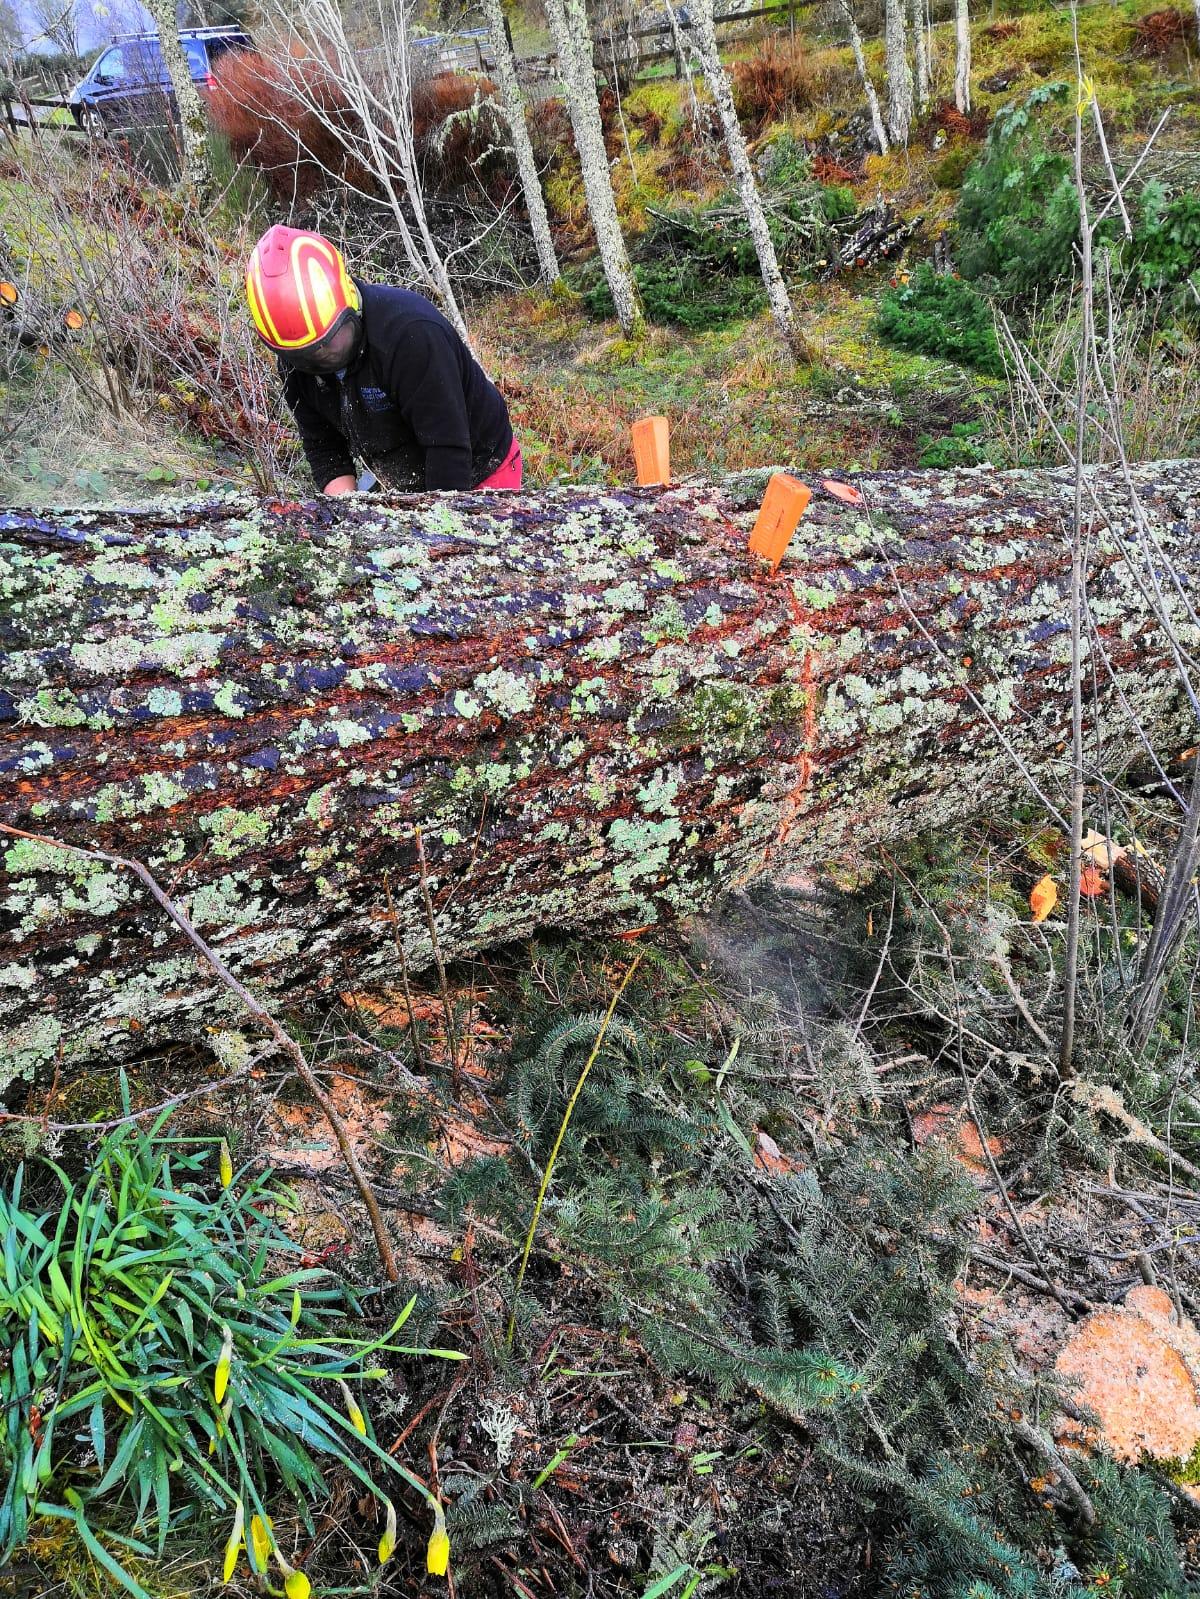 Mark cutting the first log